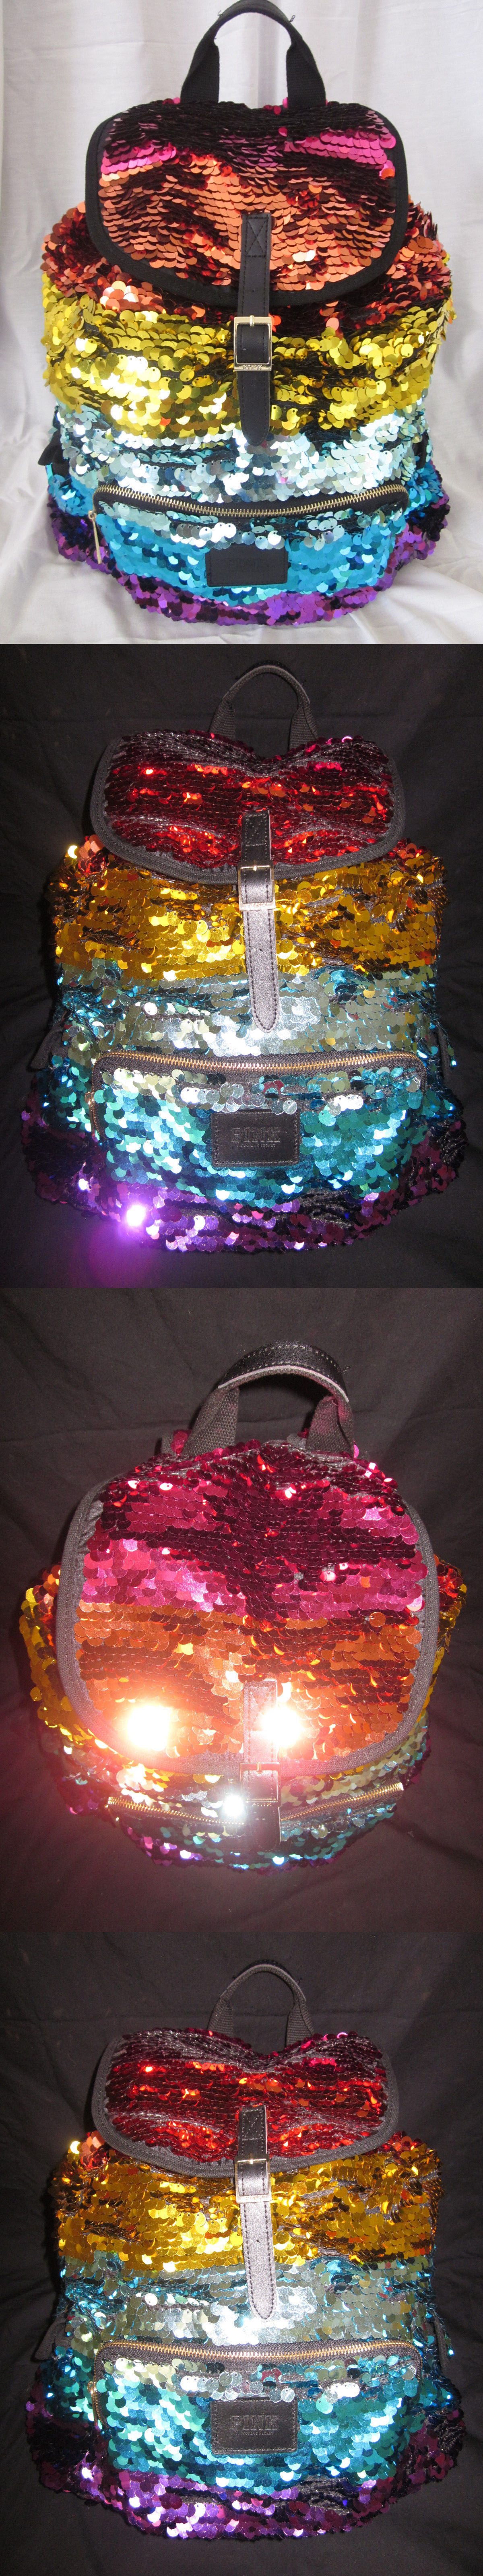 backpacks and bookbags victoria s secret pink backpack